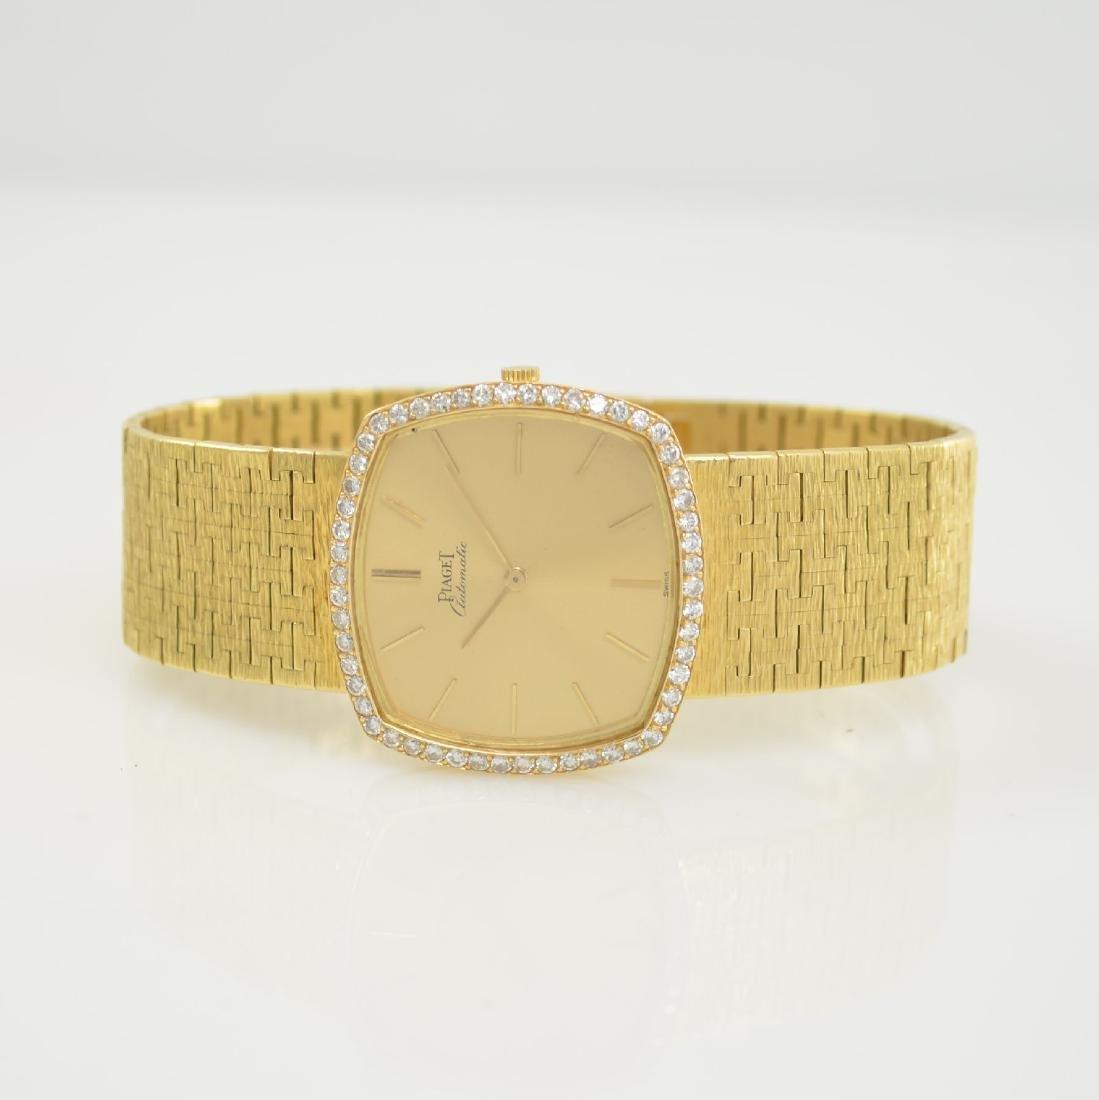 PIAGET 18k yellow gold diamond set gents wristwatch